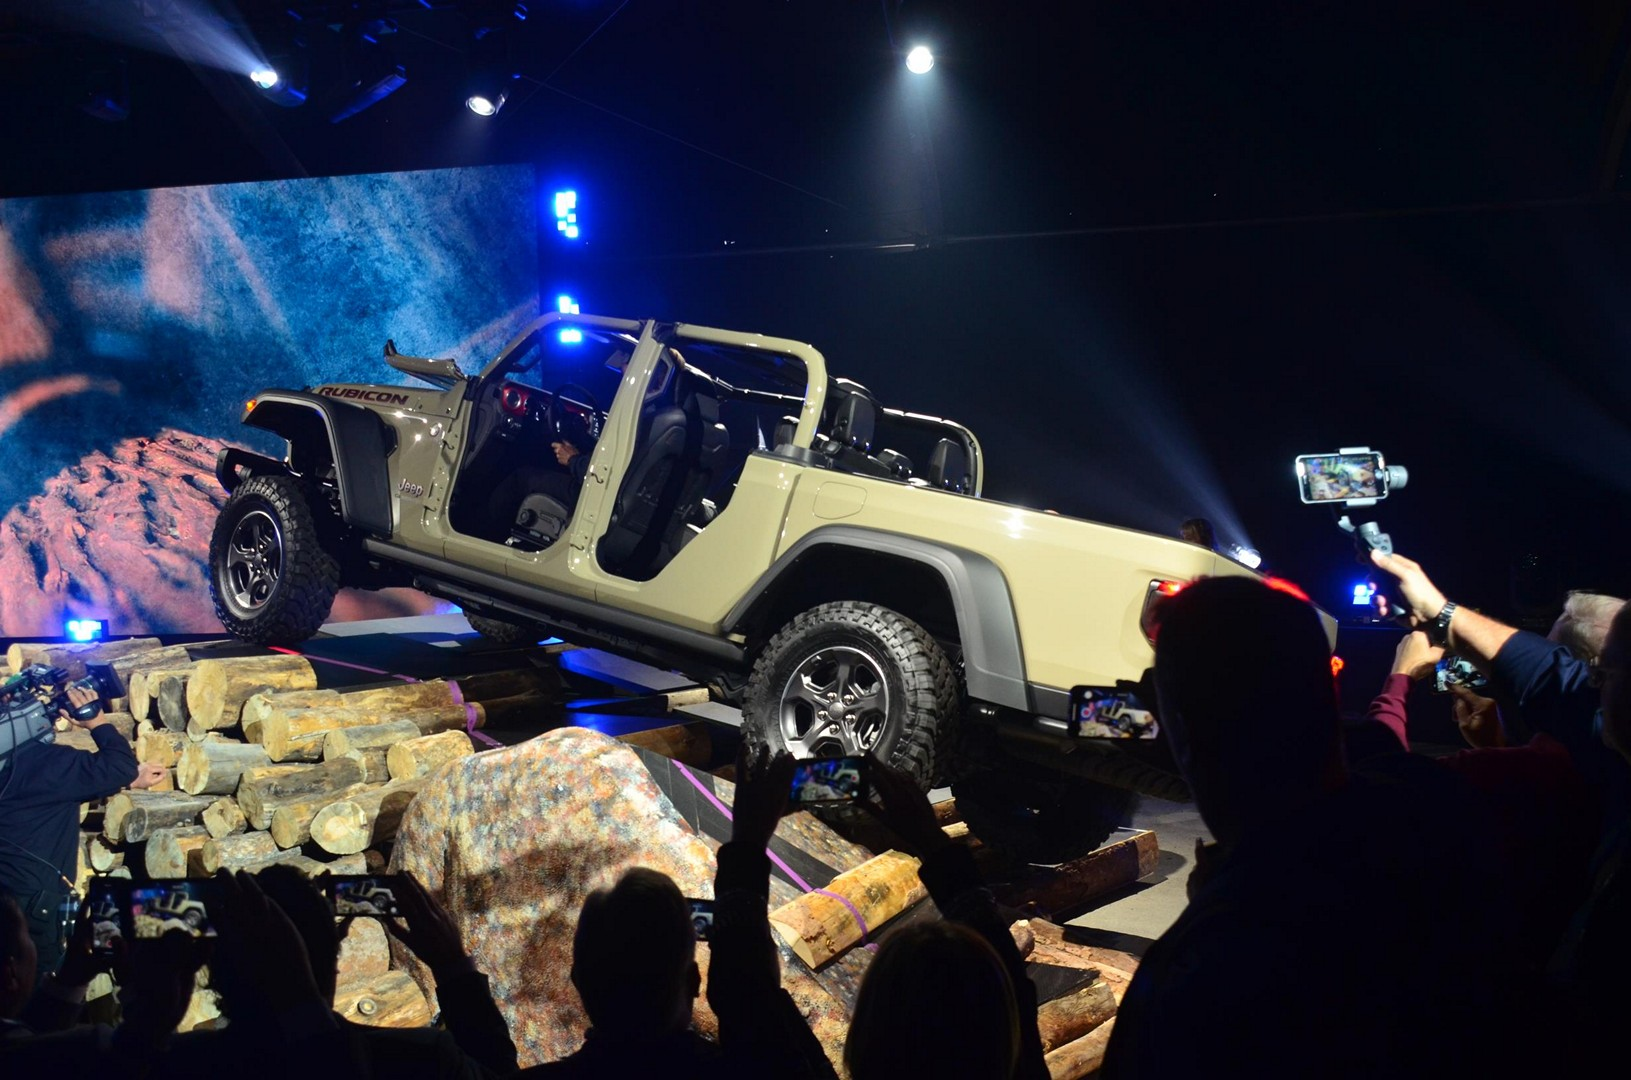 2020 Jeep Gladiator Looks Impressive At The La Auto Show